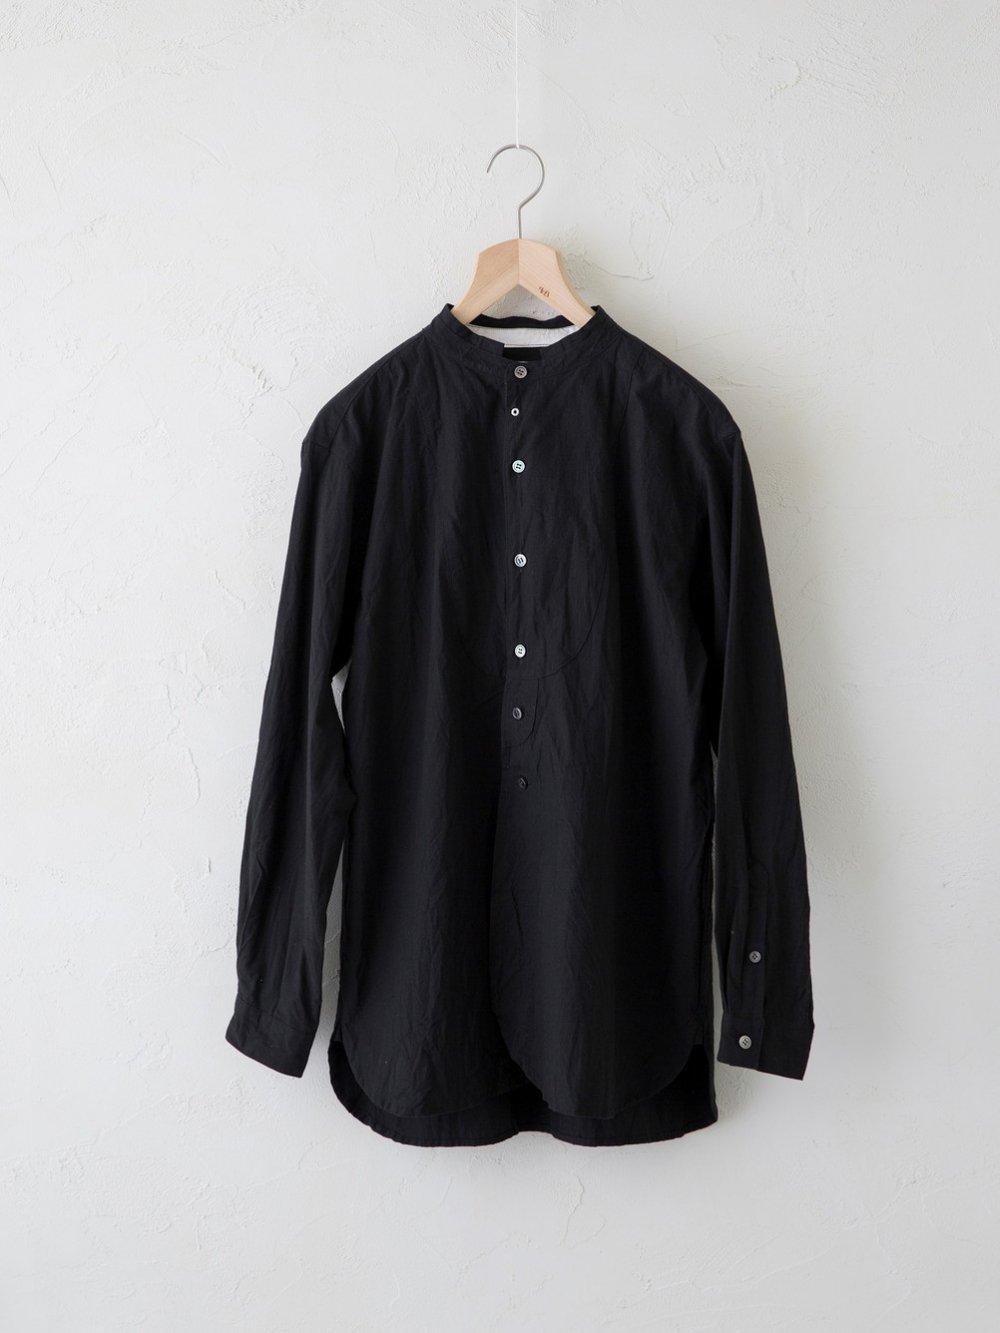 Cotton Linen Typewriter バンドカラーシャツ(Ladies' & Men's)